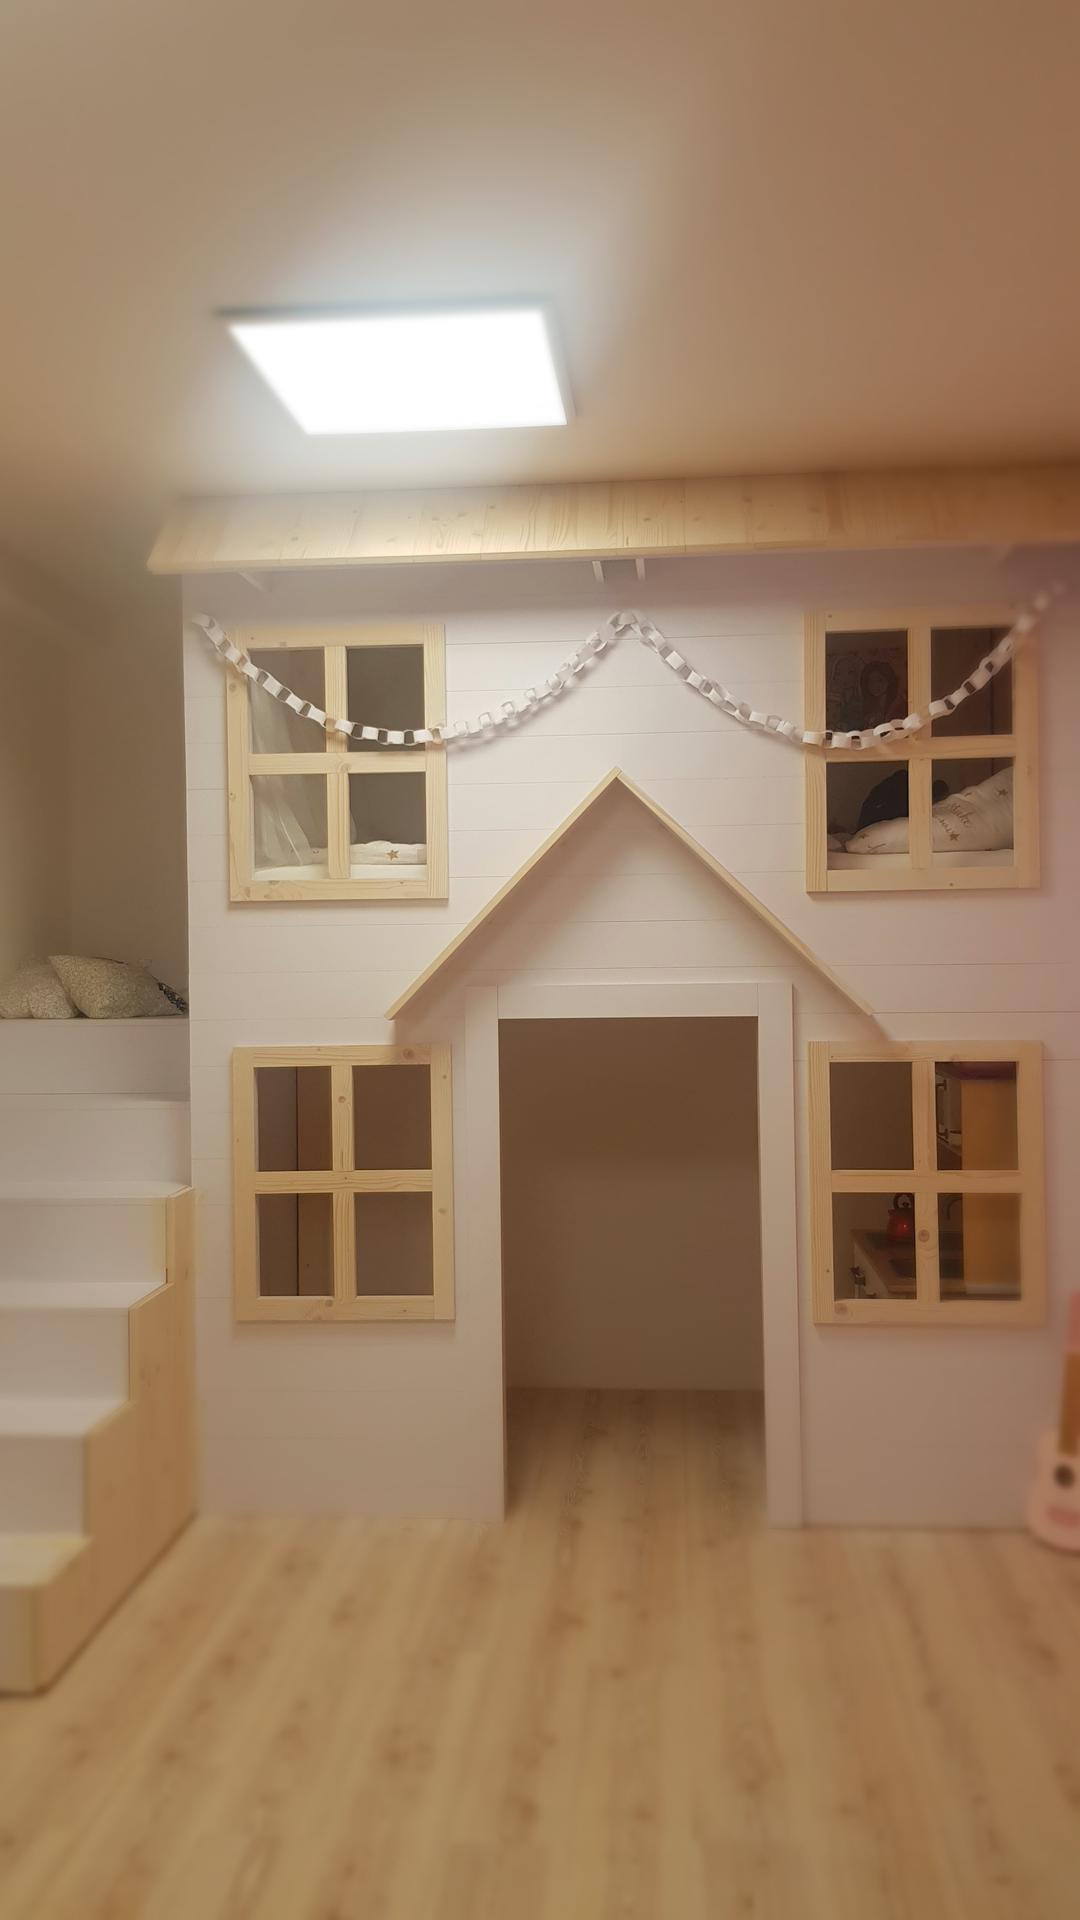 Naša rekonštrukcia - hotovo :) este pridu nejake kvietky, lampa a ostatne drobnosti :)